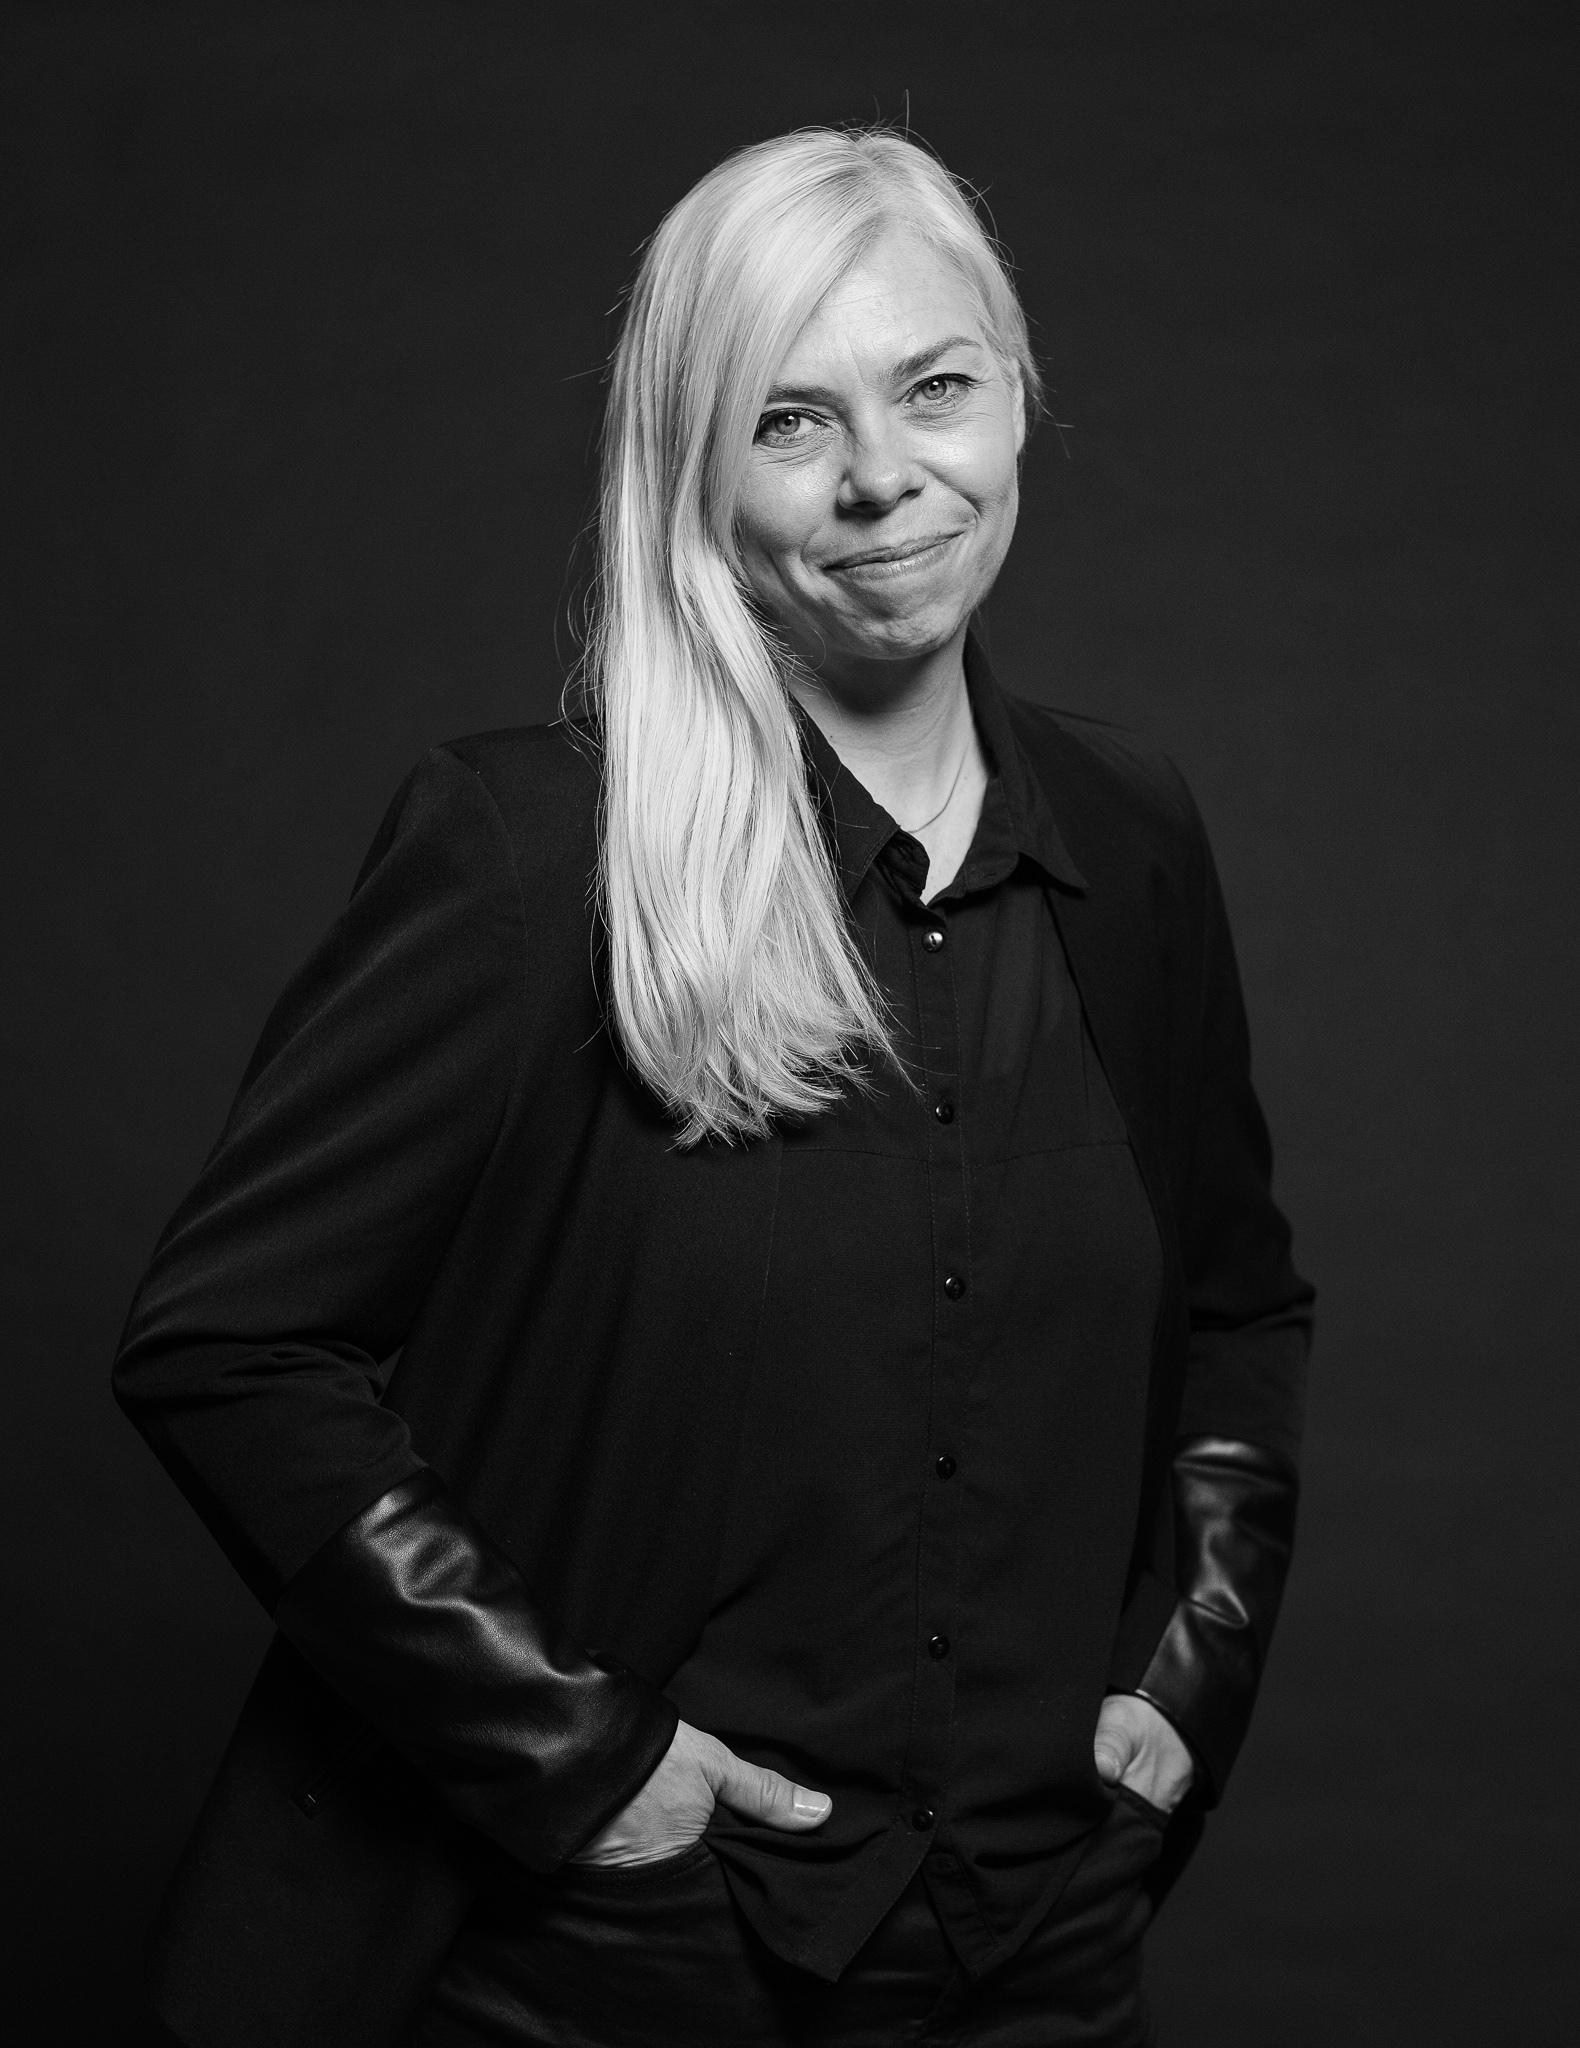 Eva Albrechtsen Krath